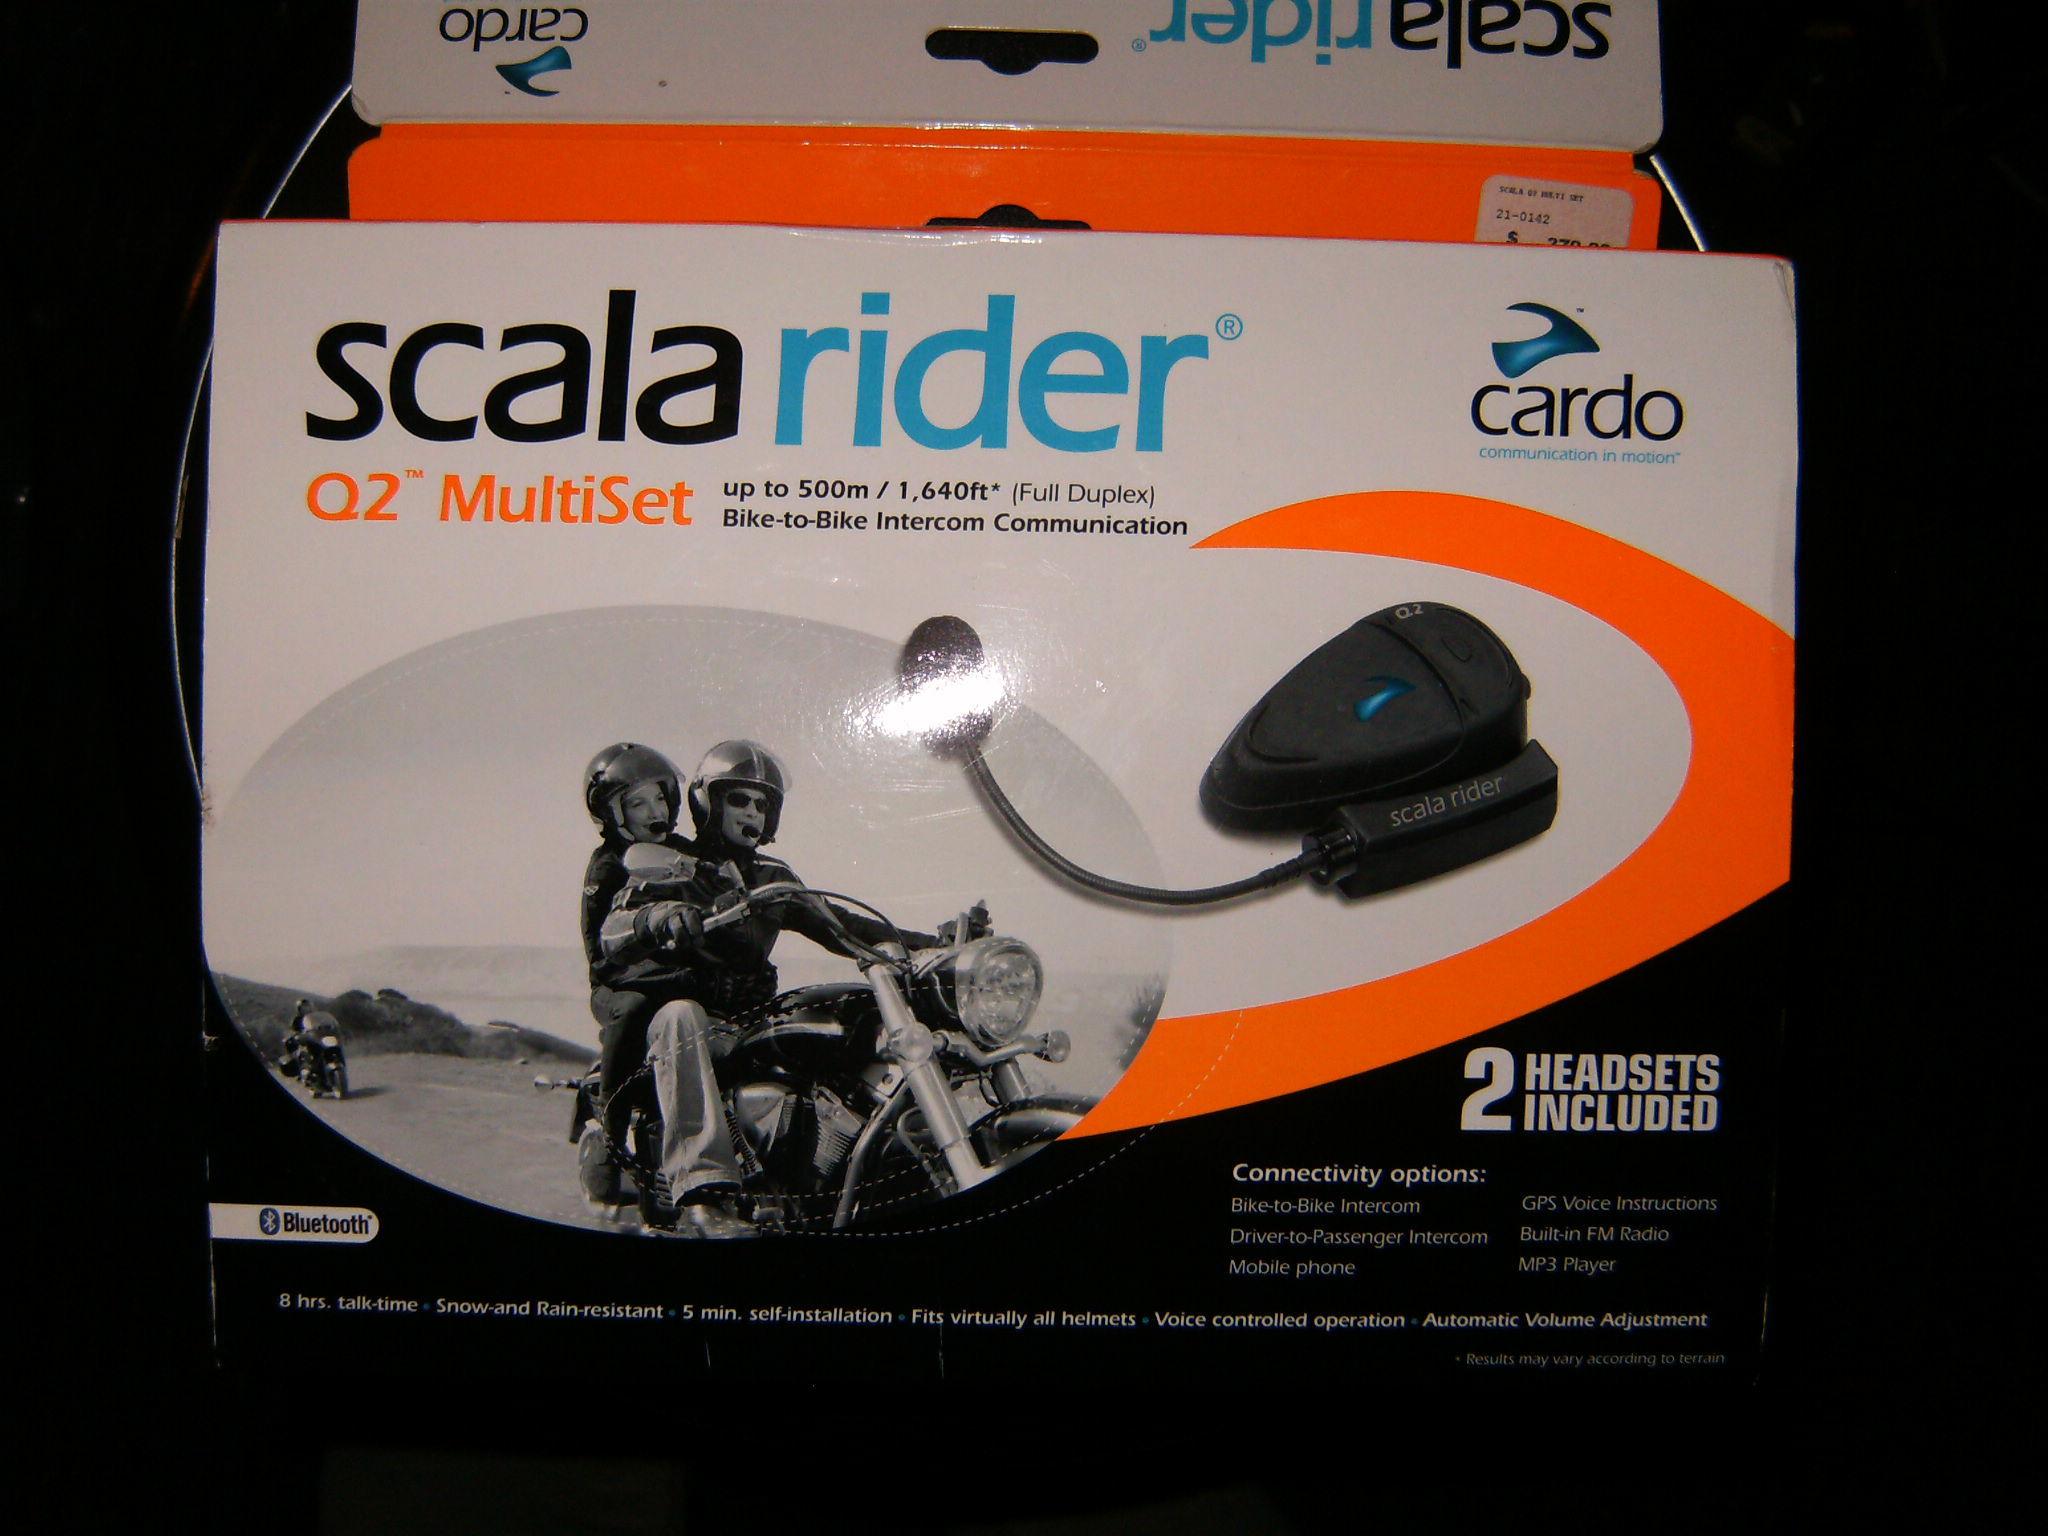 Scalarider q2 multiset pro manual english | bluetooth.